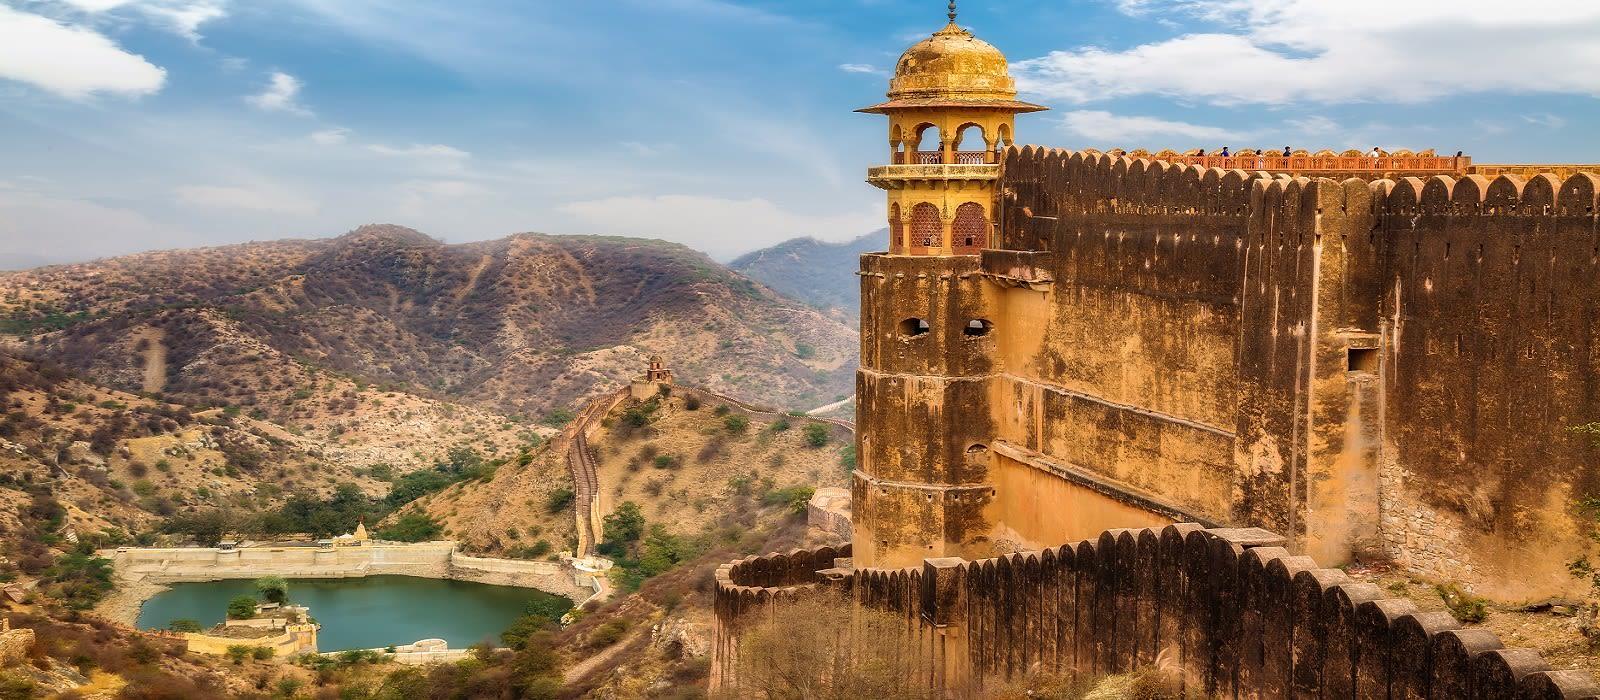 Luxurious Rajasthan and the Taj Mahal: Oberoi Special Tour Trip 5